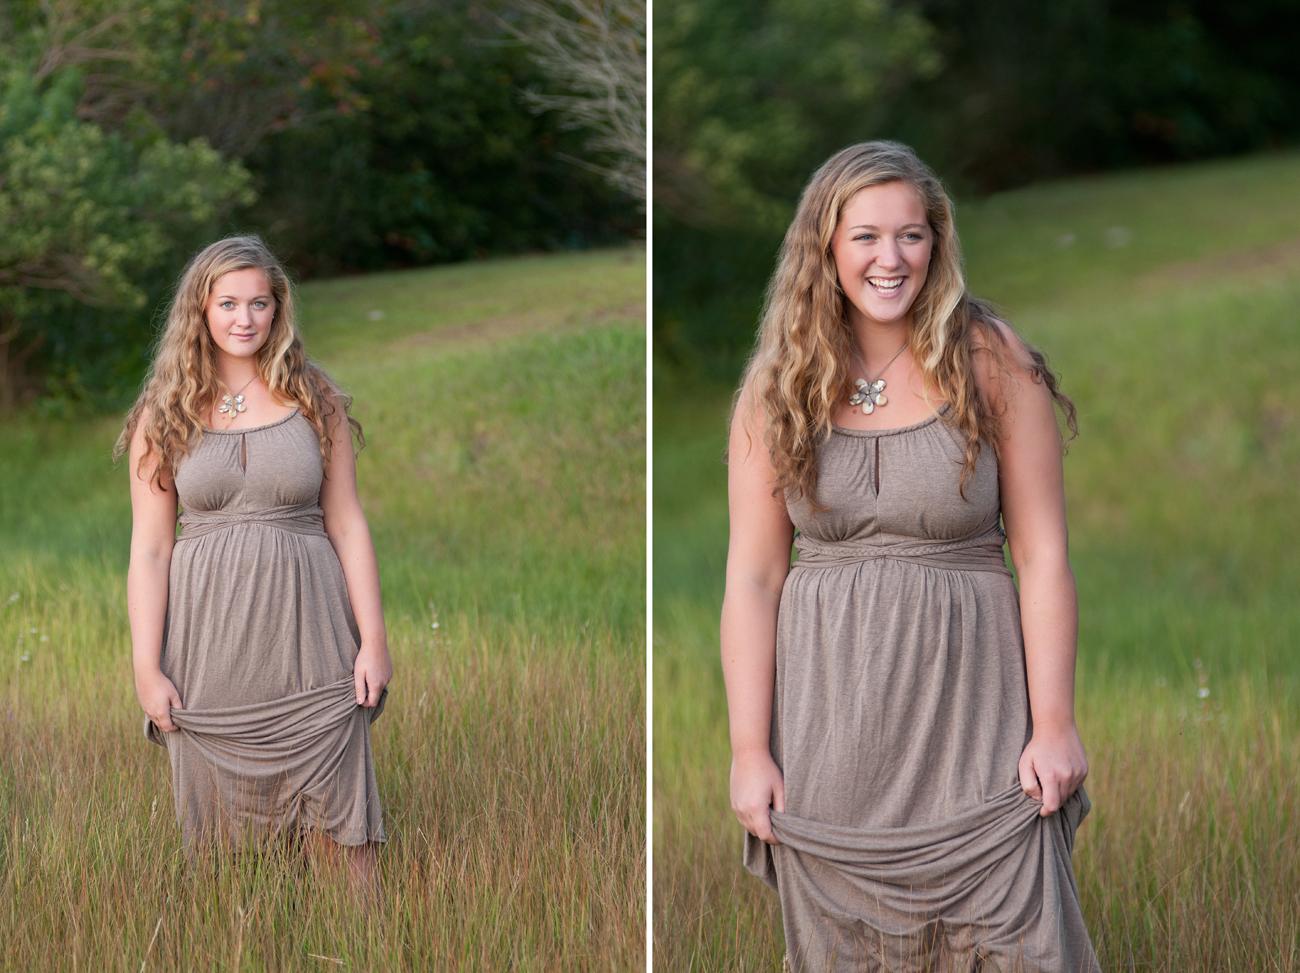 Angela-Chicoski-Photography-Connecticut-Wedding-High-School-Senior-Boudoir-Photographer_014.jpg